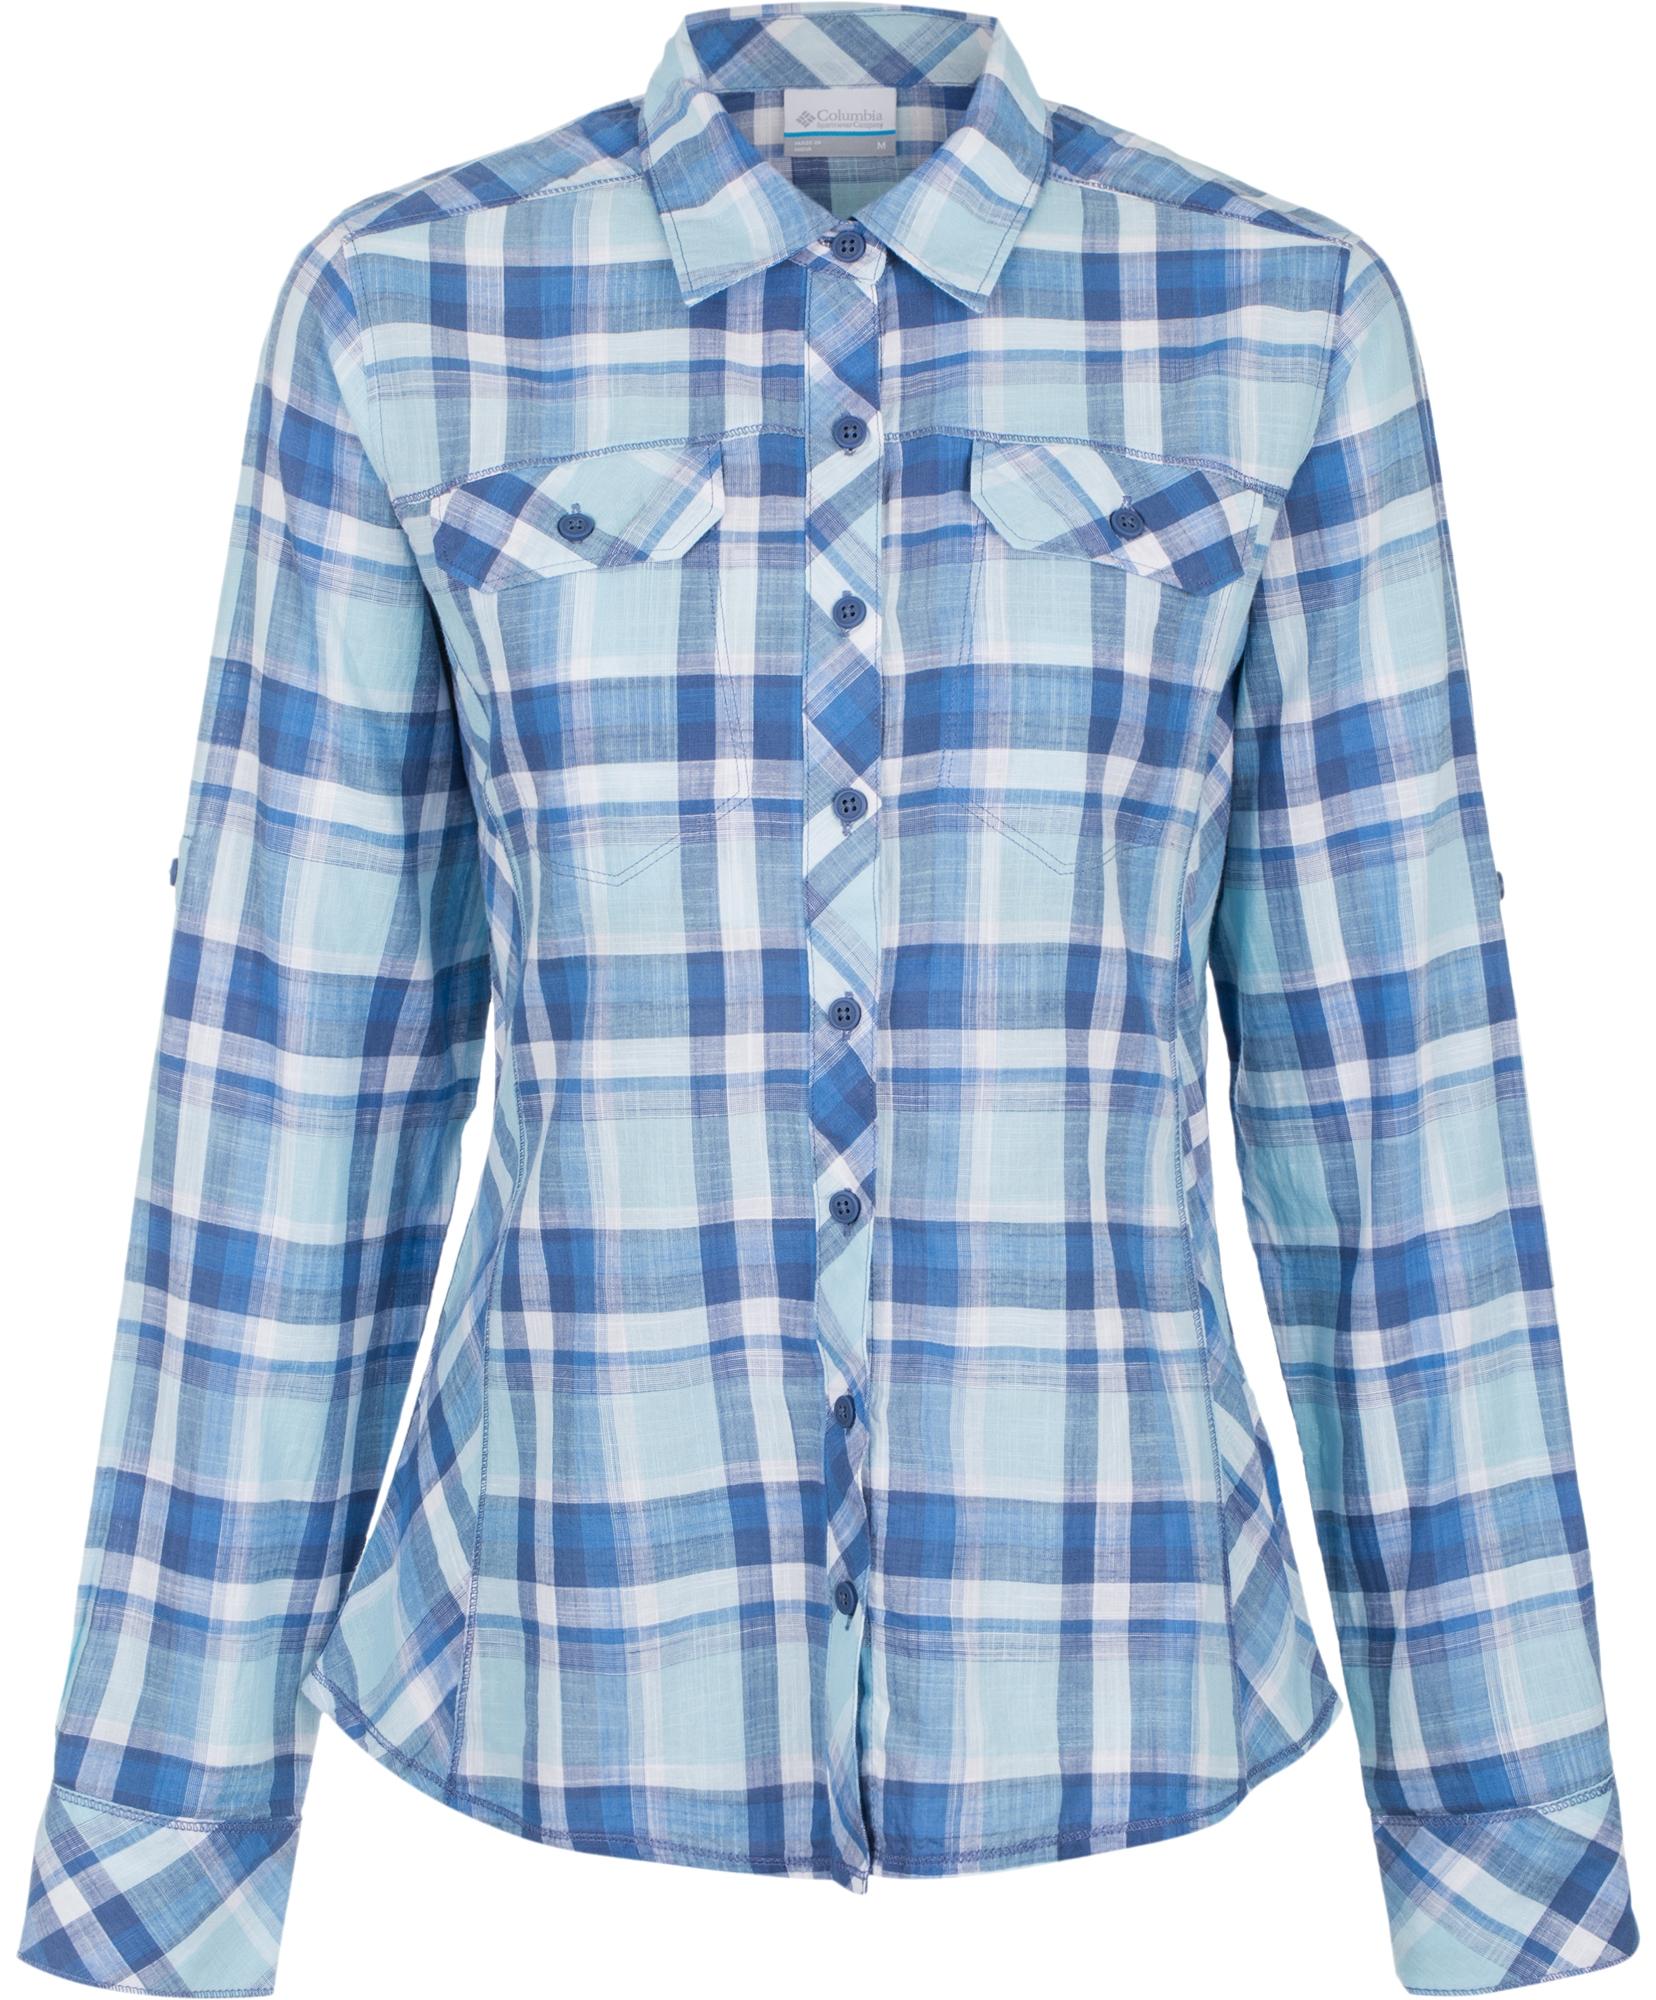 7f98aabbd16 Рубашка женская Columbia Camp Henry™ сиреневая клетка арт.1450321-509. 44.50 р.